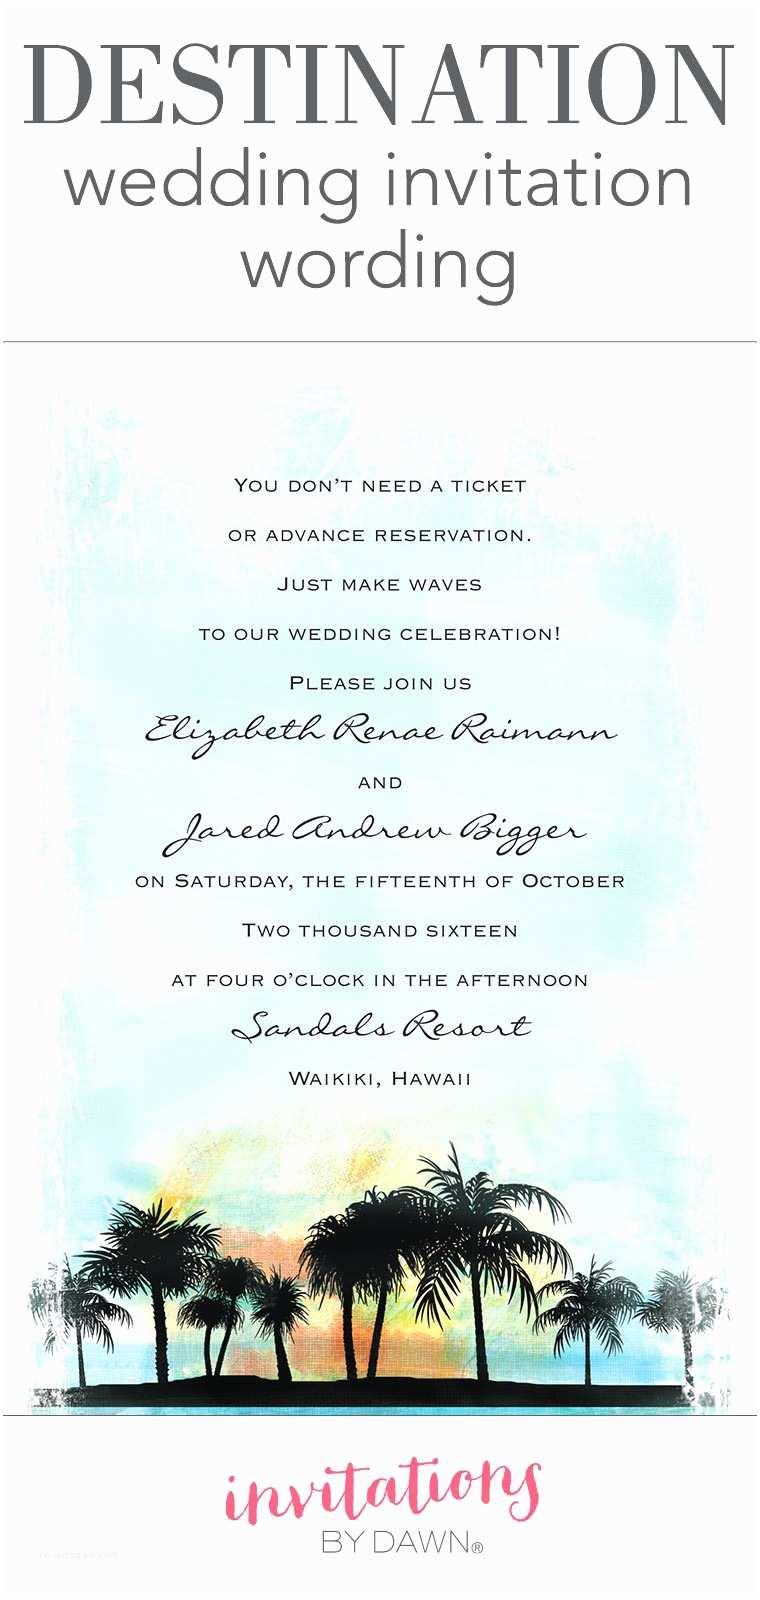 Wedding Invitation Wording From Nephew 55 Unique Destination Wedding Save the Date Wording